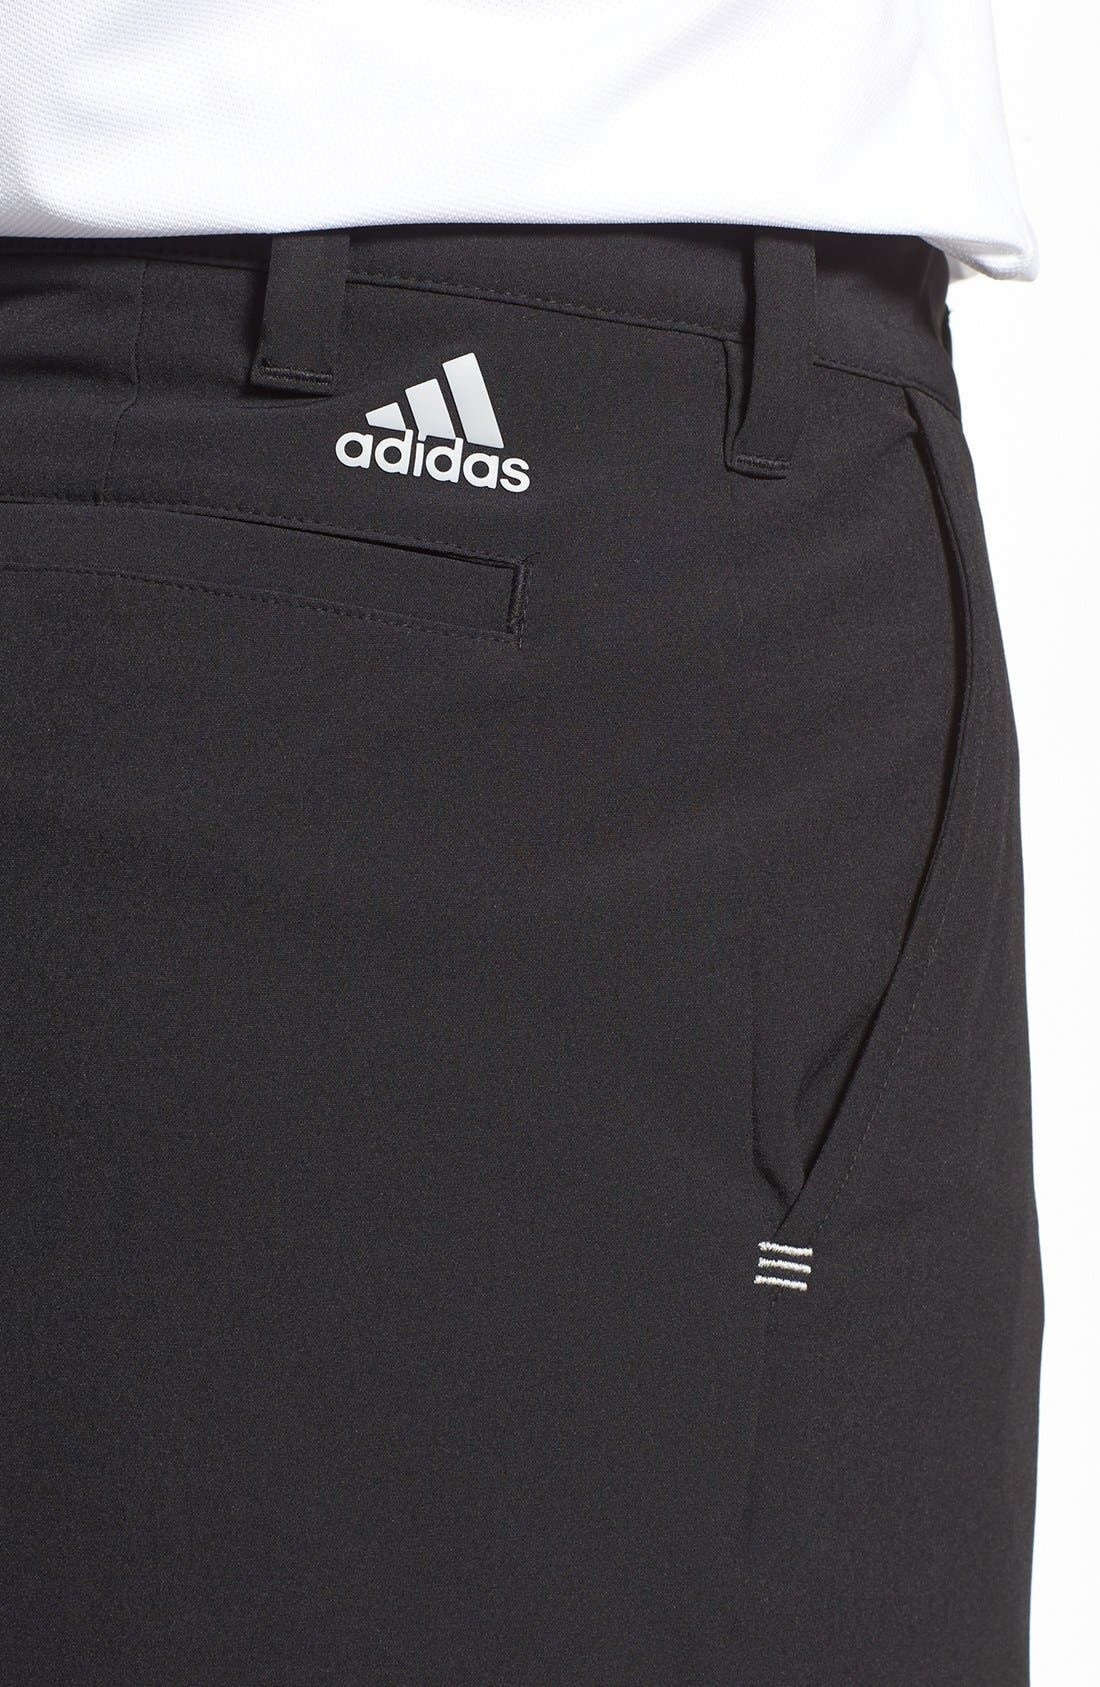 'Ultimate' Golf Shorts,                             Alternate thumbnail 22, color,